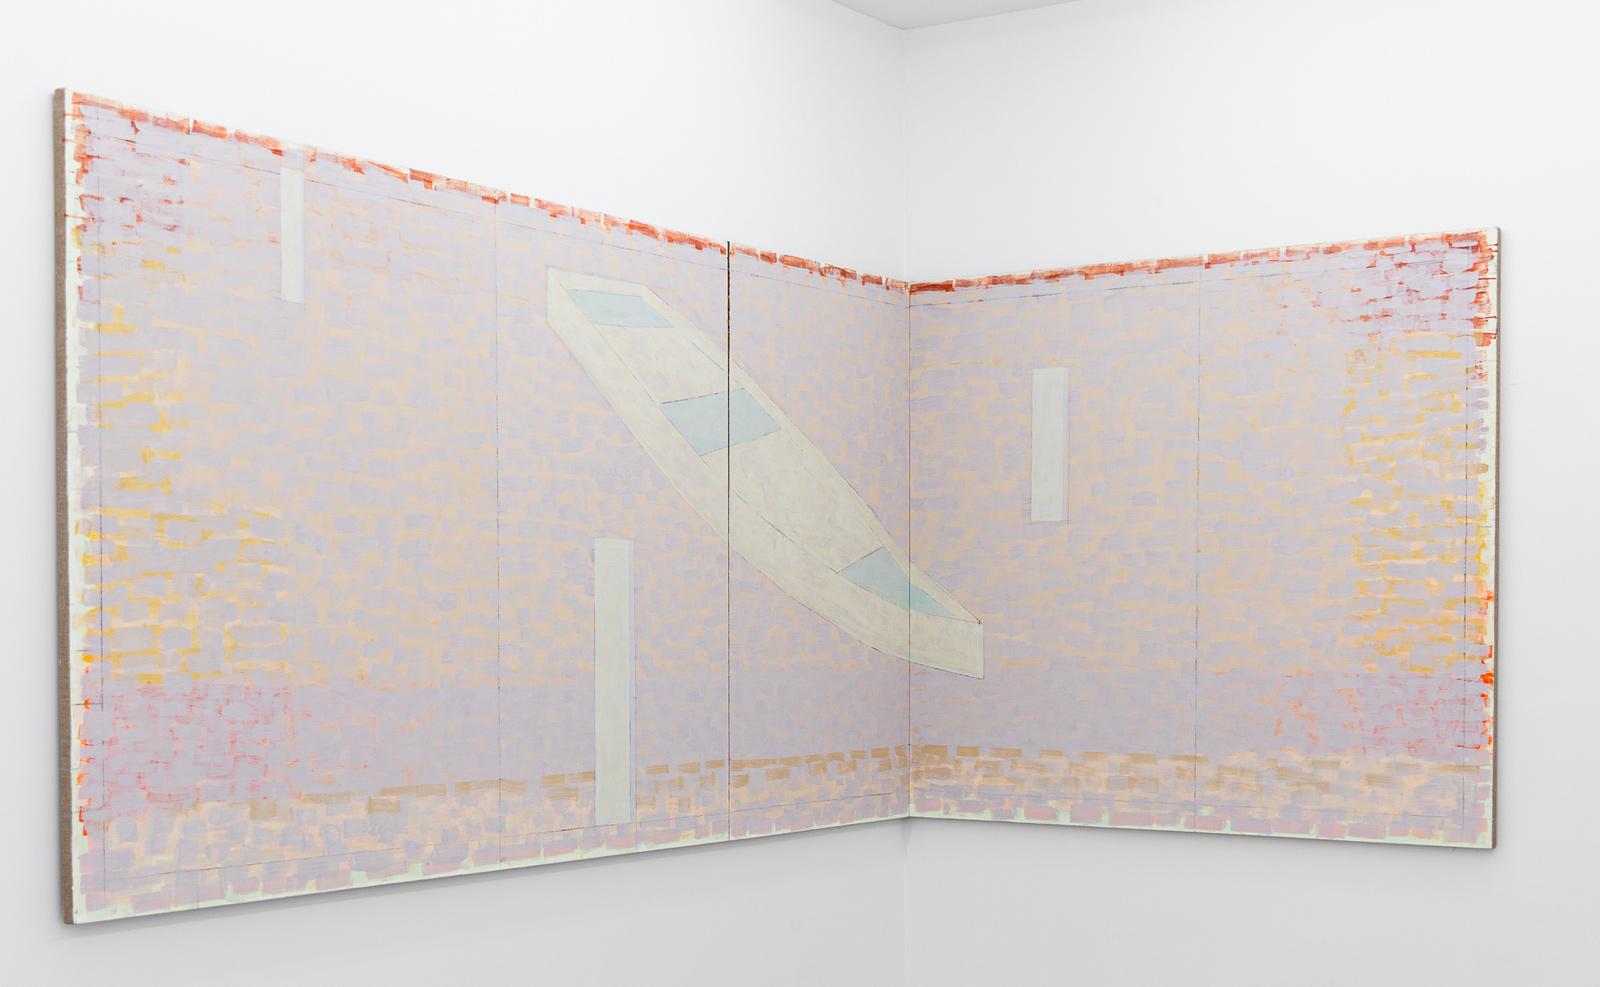 Donau, 2020, Egg tempera on canvas, 155 x 470 cm (in three parts)